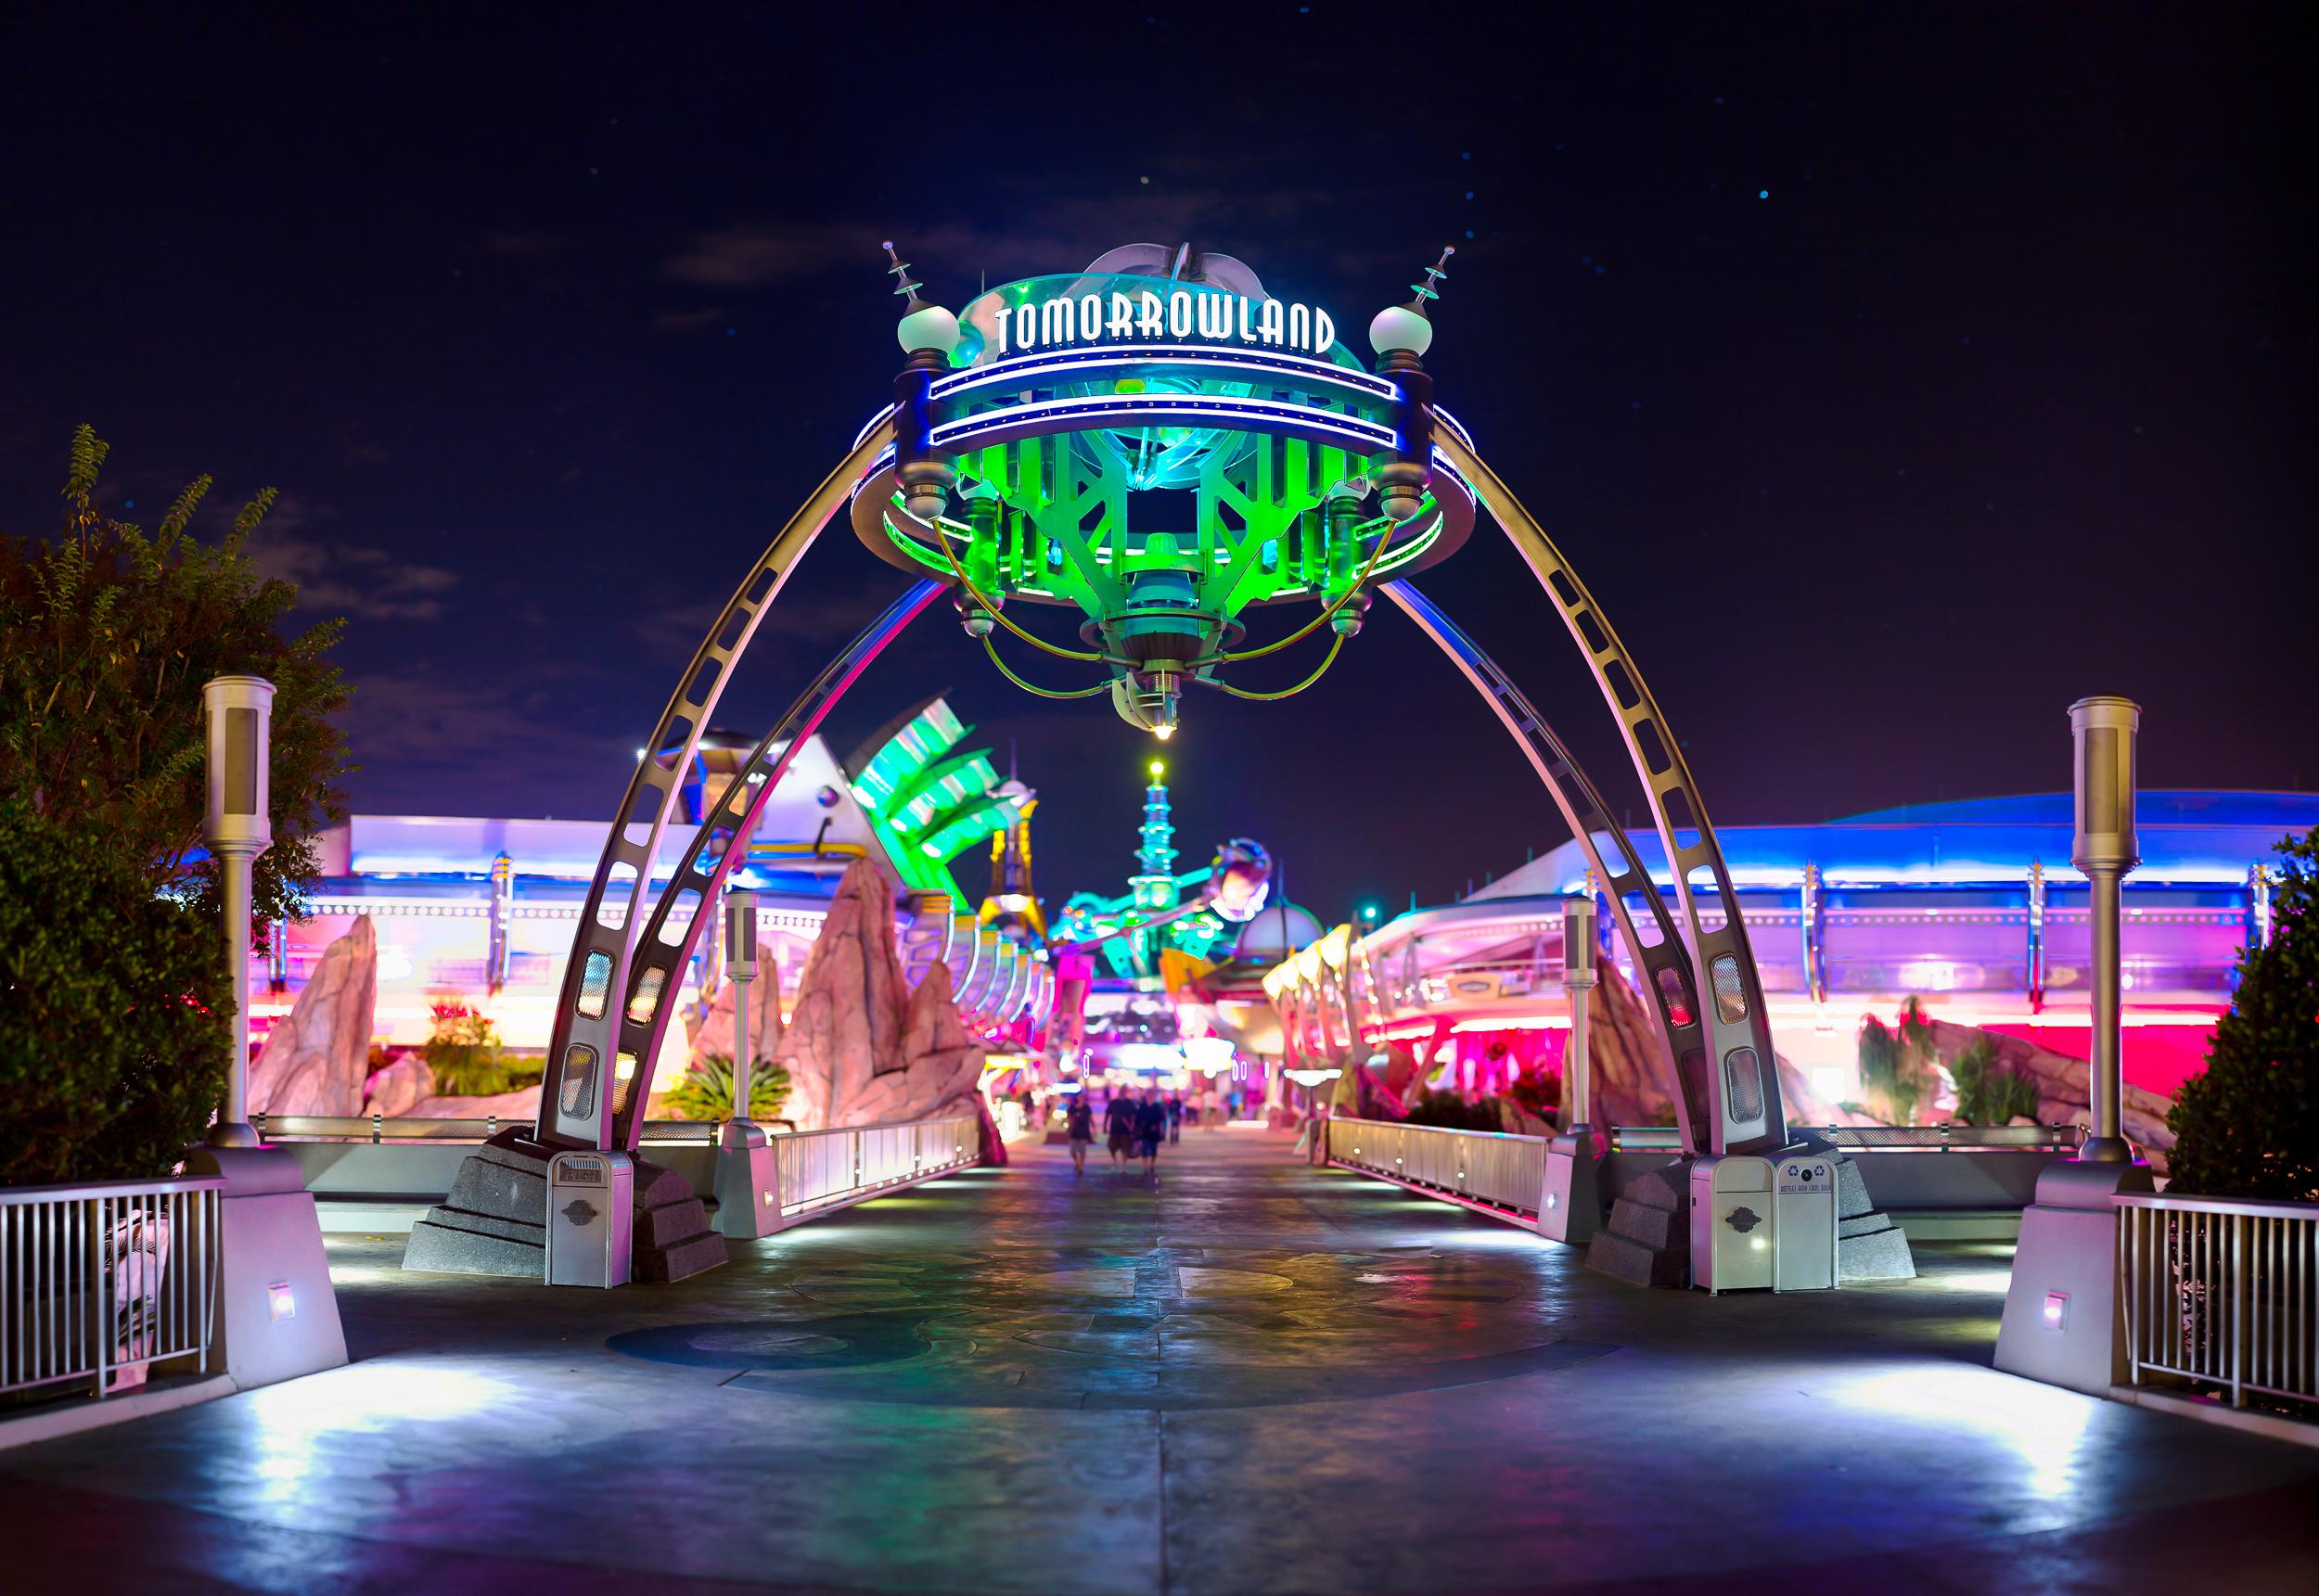 Обои Rollercoaster ride, ночь. Города foto 9